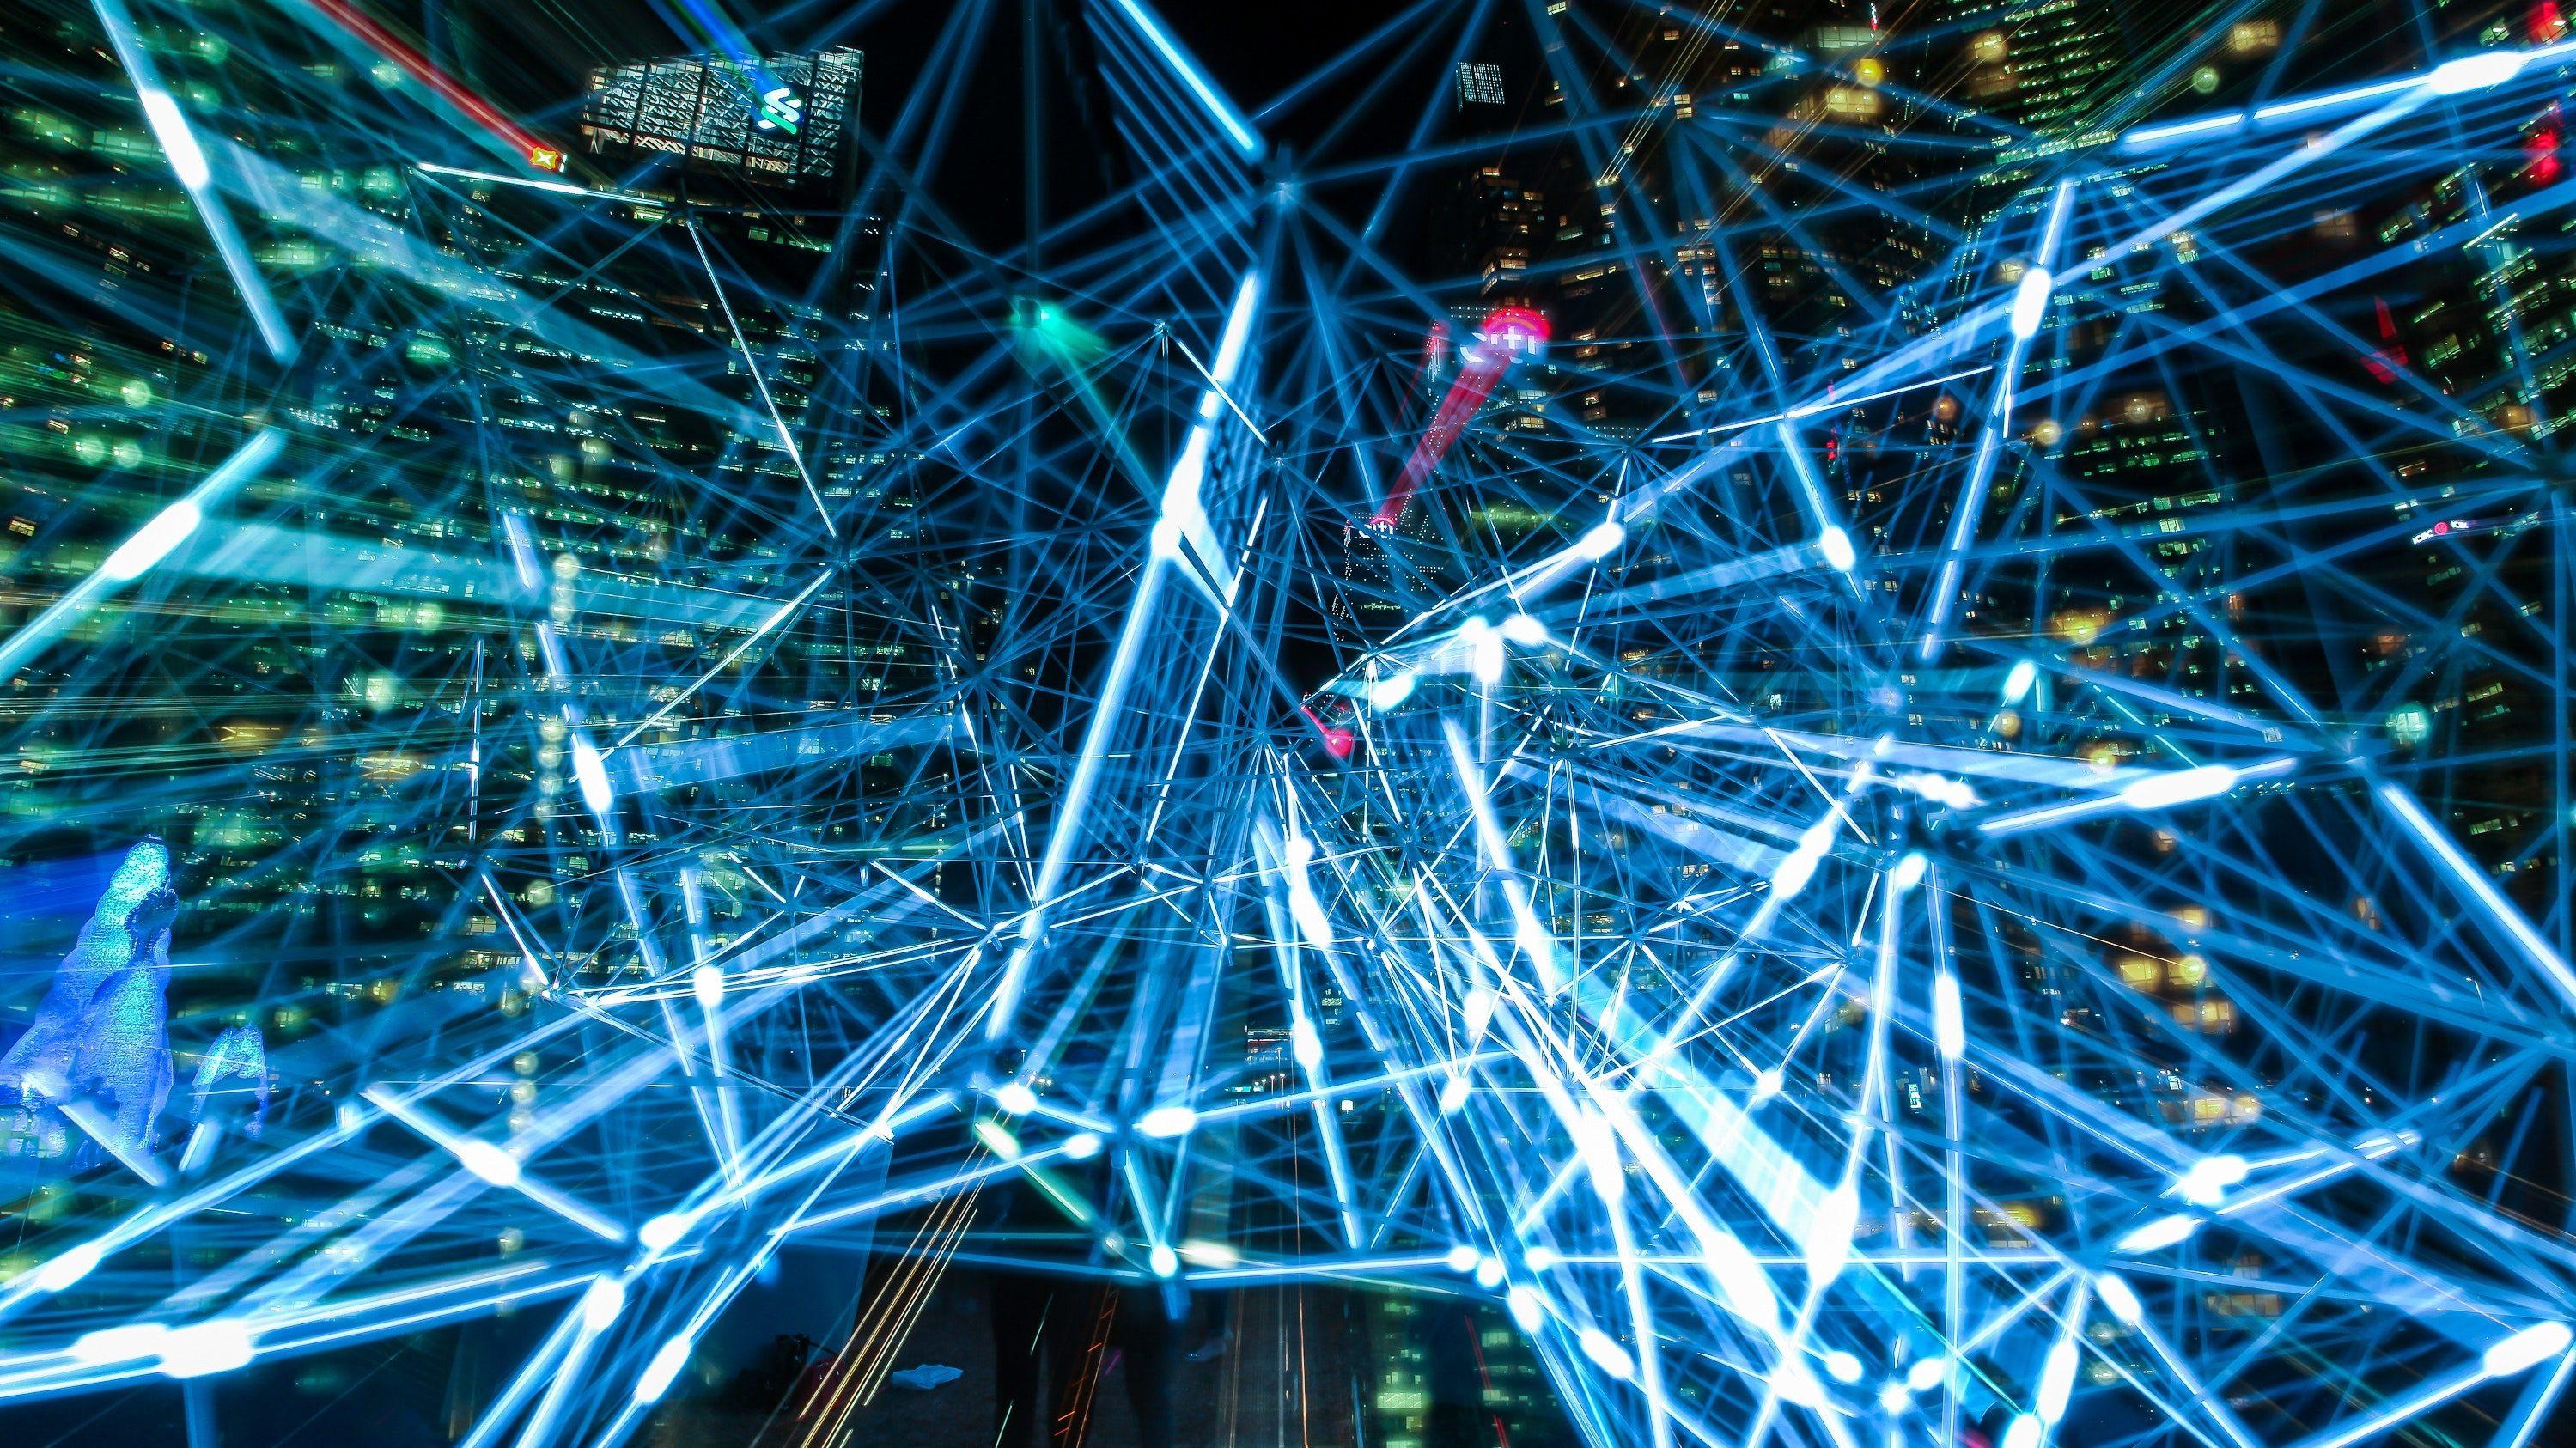 Ethereum falls below $200 in market decline